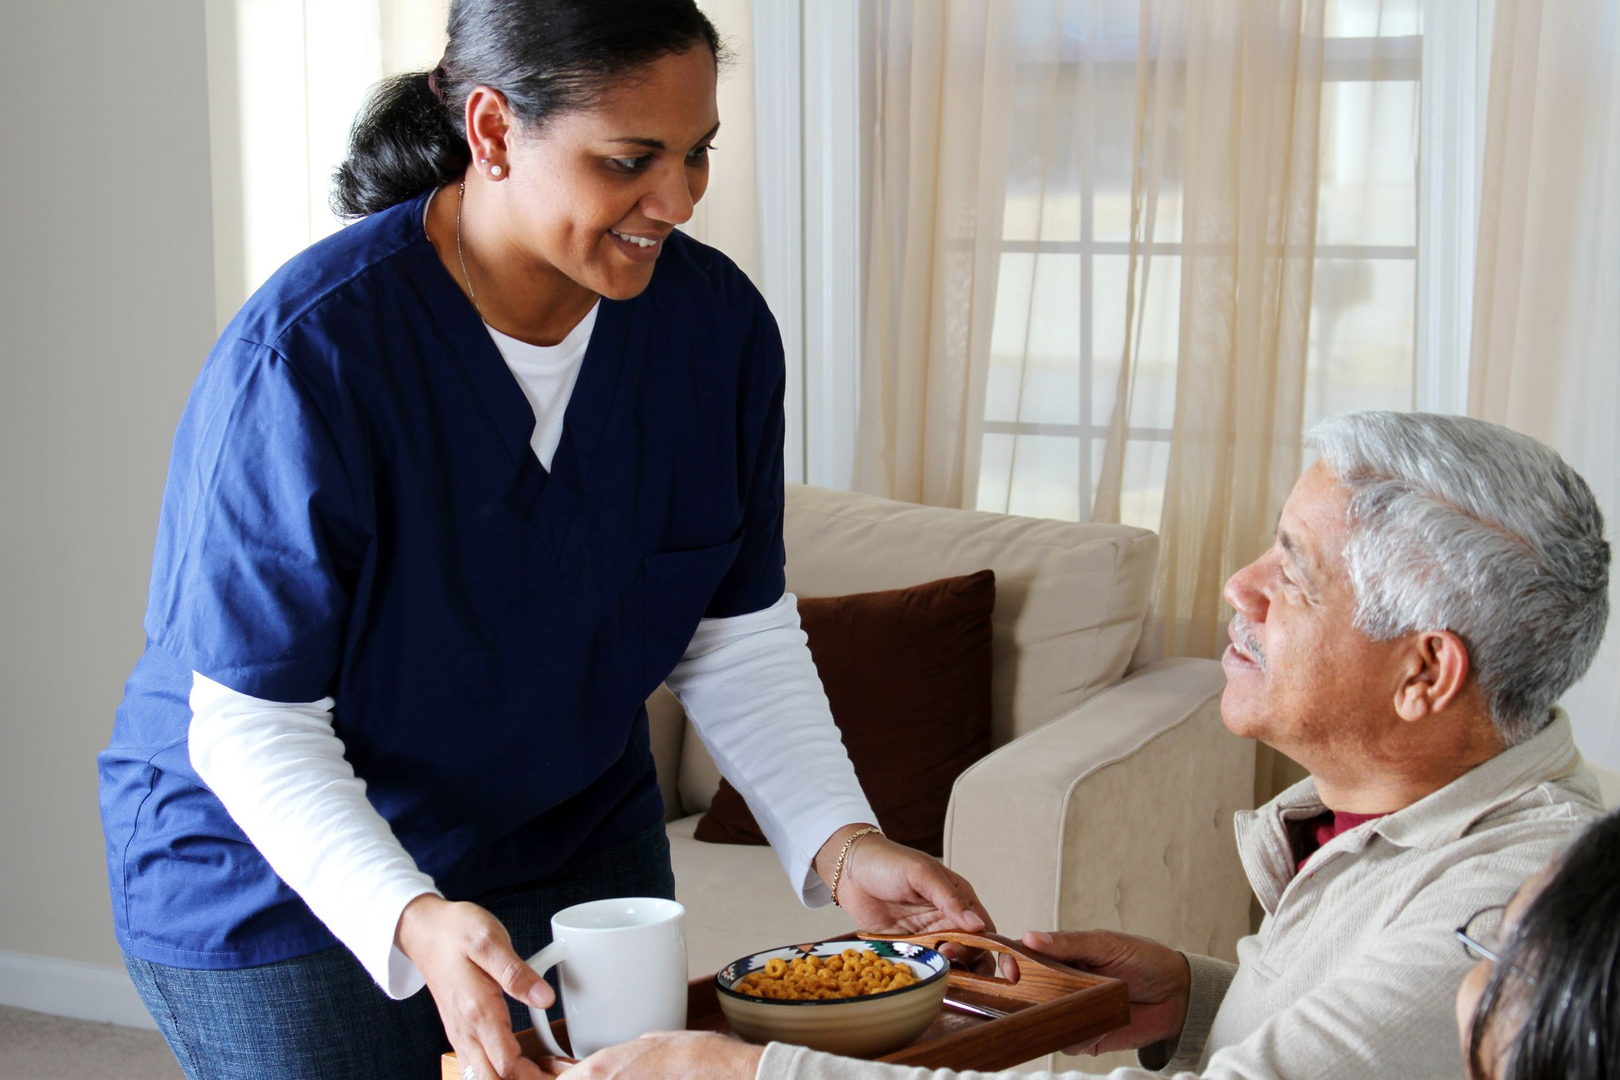 elite+home+health+care